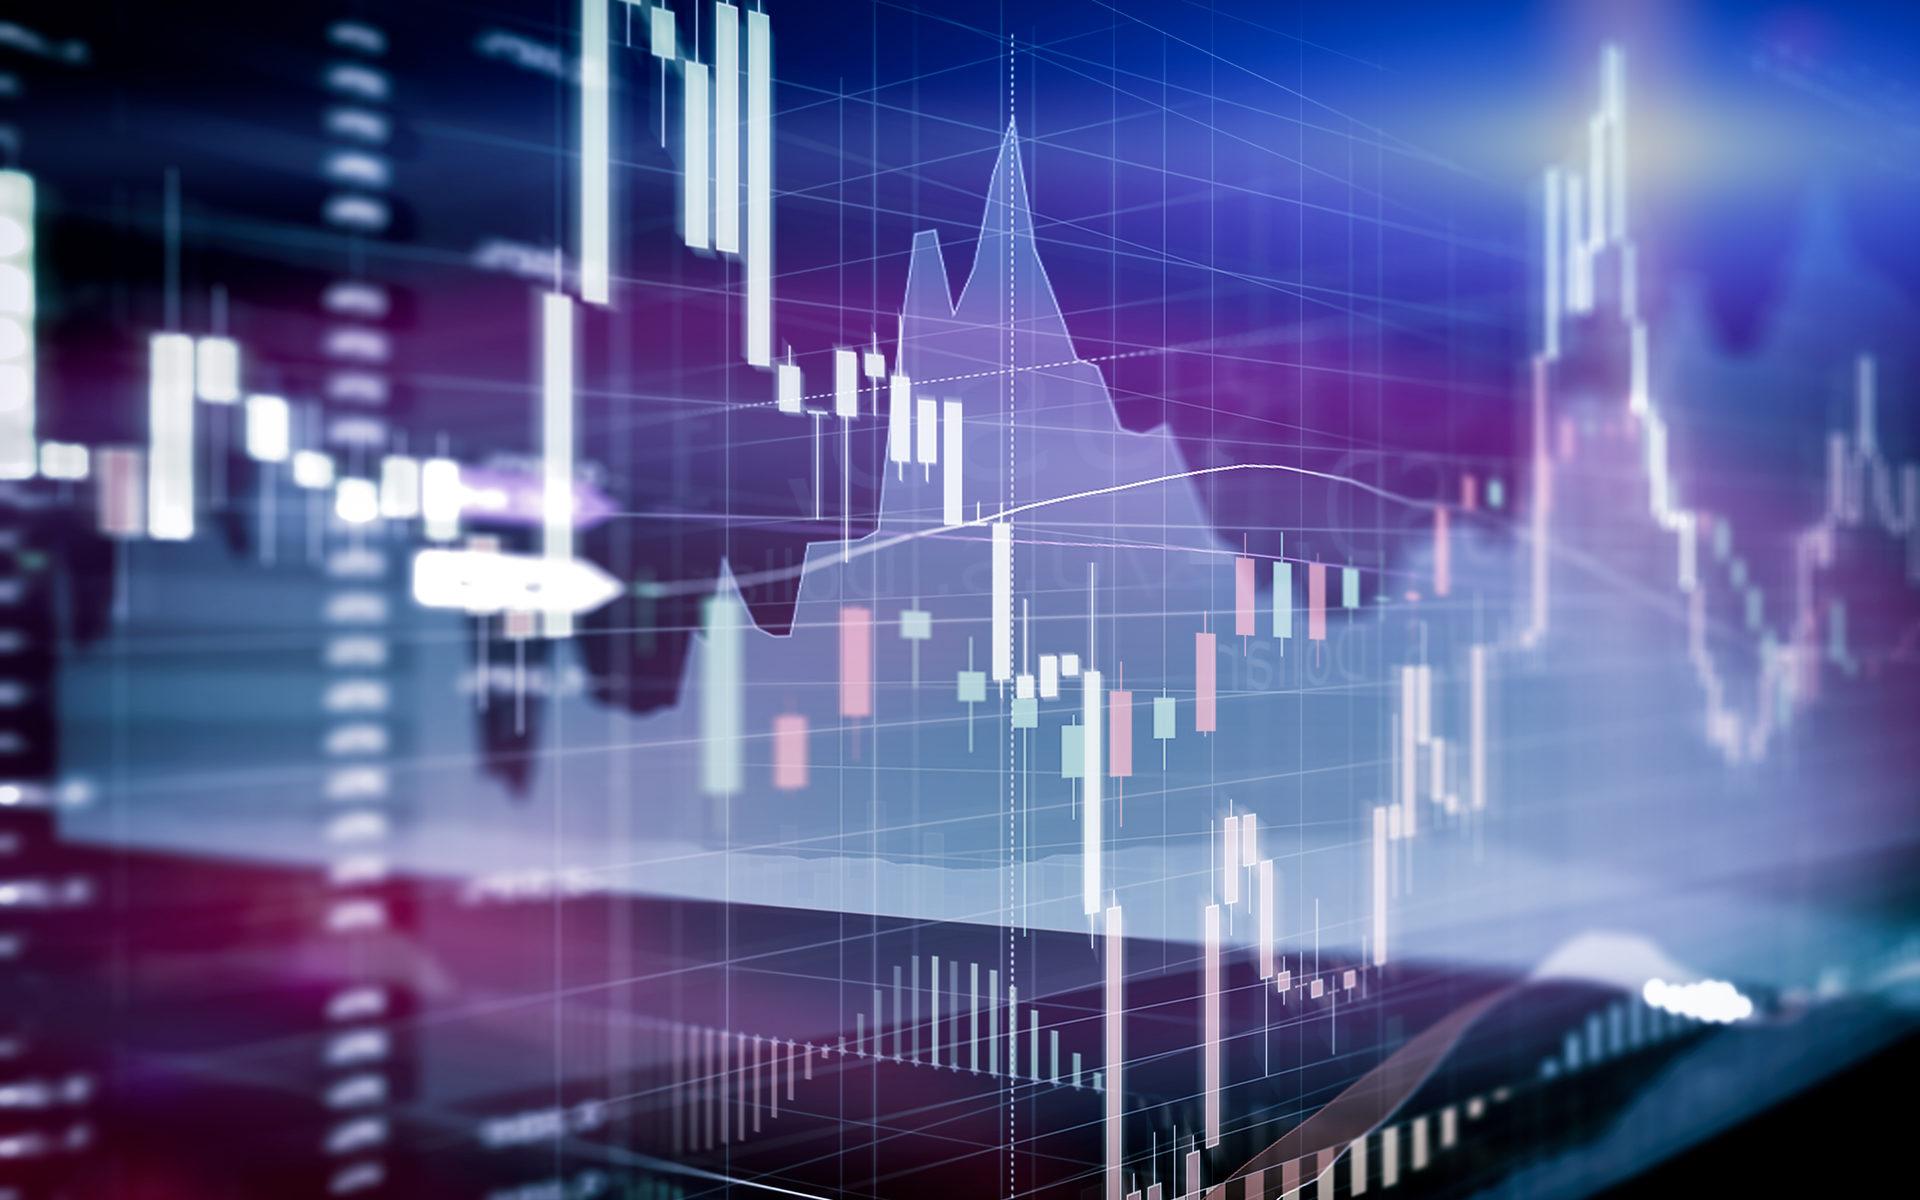 Bitcoin Price Analysis: BTC Bears Eye $8.8K Target